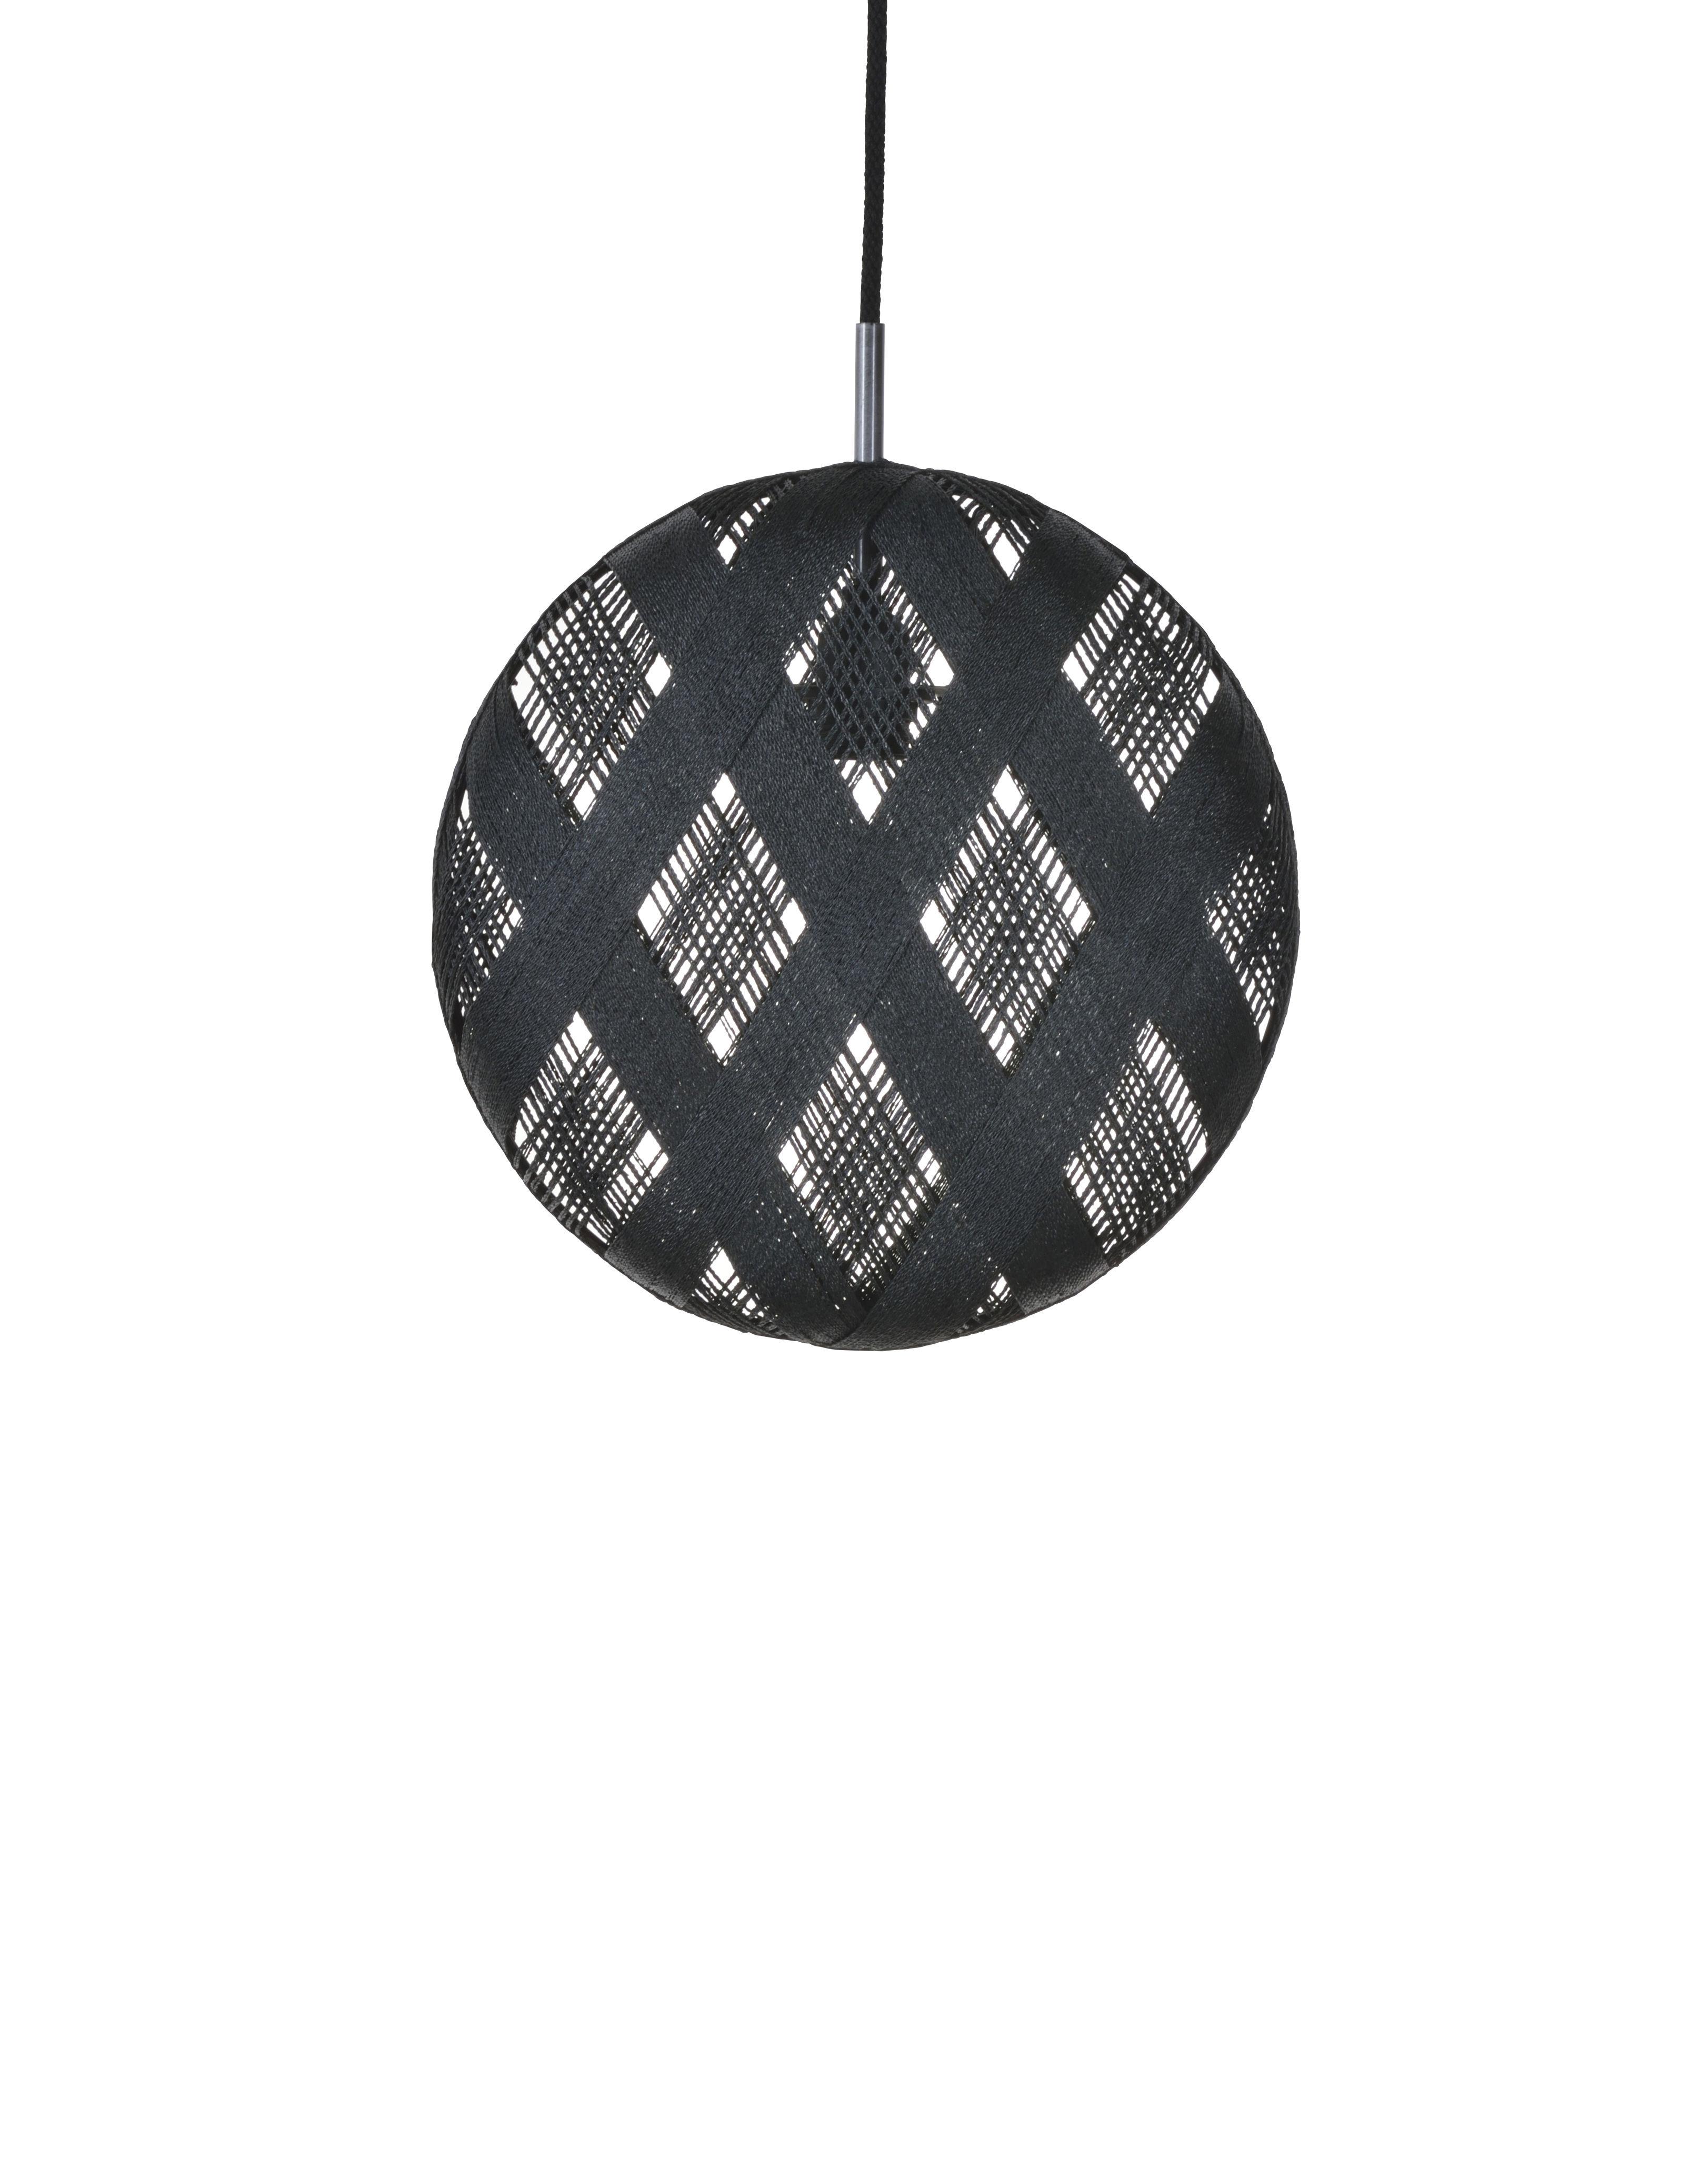 Lighting - Pendant Lighting - Chanpen Diamond Pendant - Ø  26 cm by Forestier - Black / Diamond patterns - Woven acaba